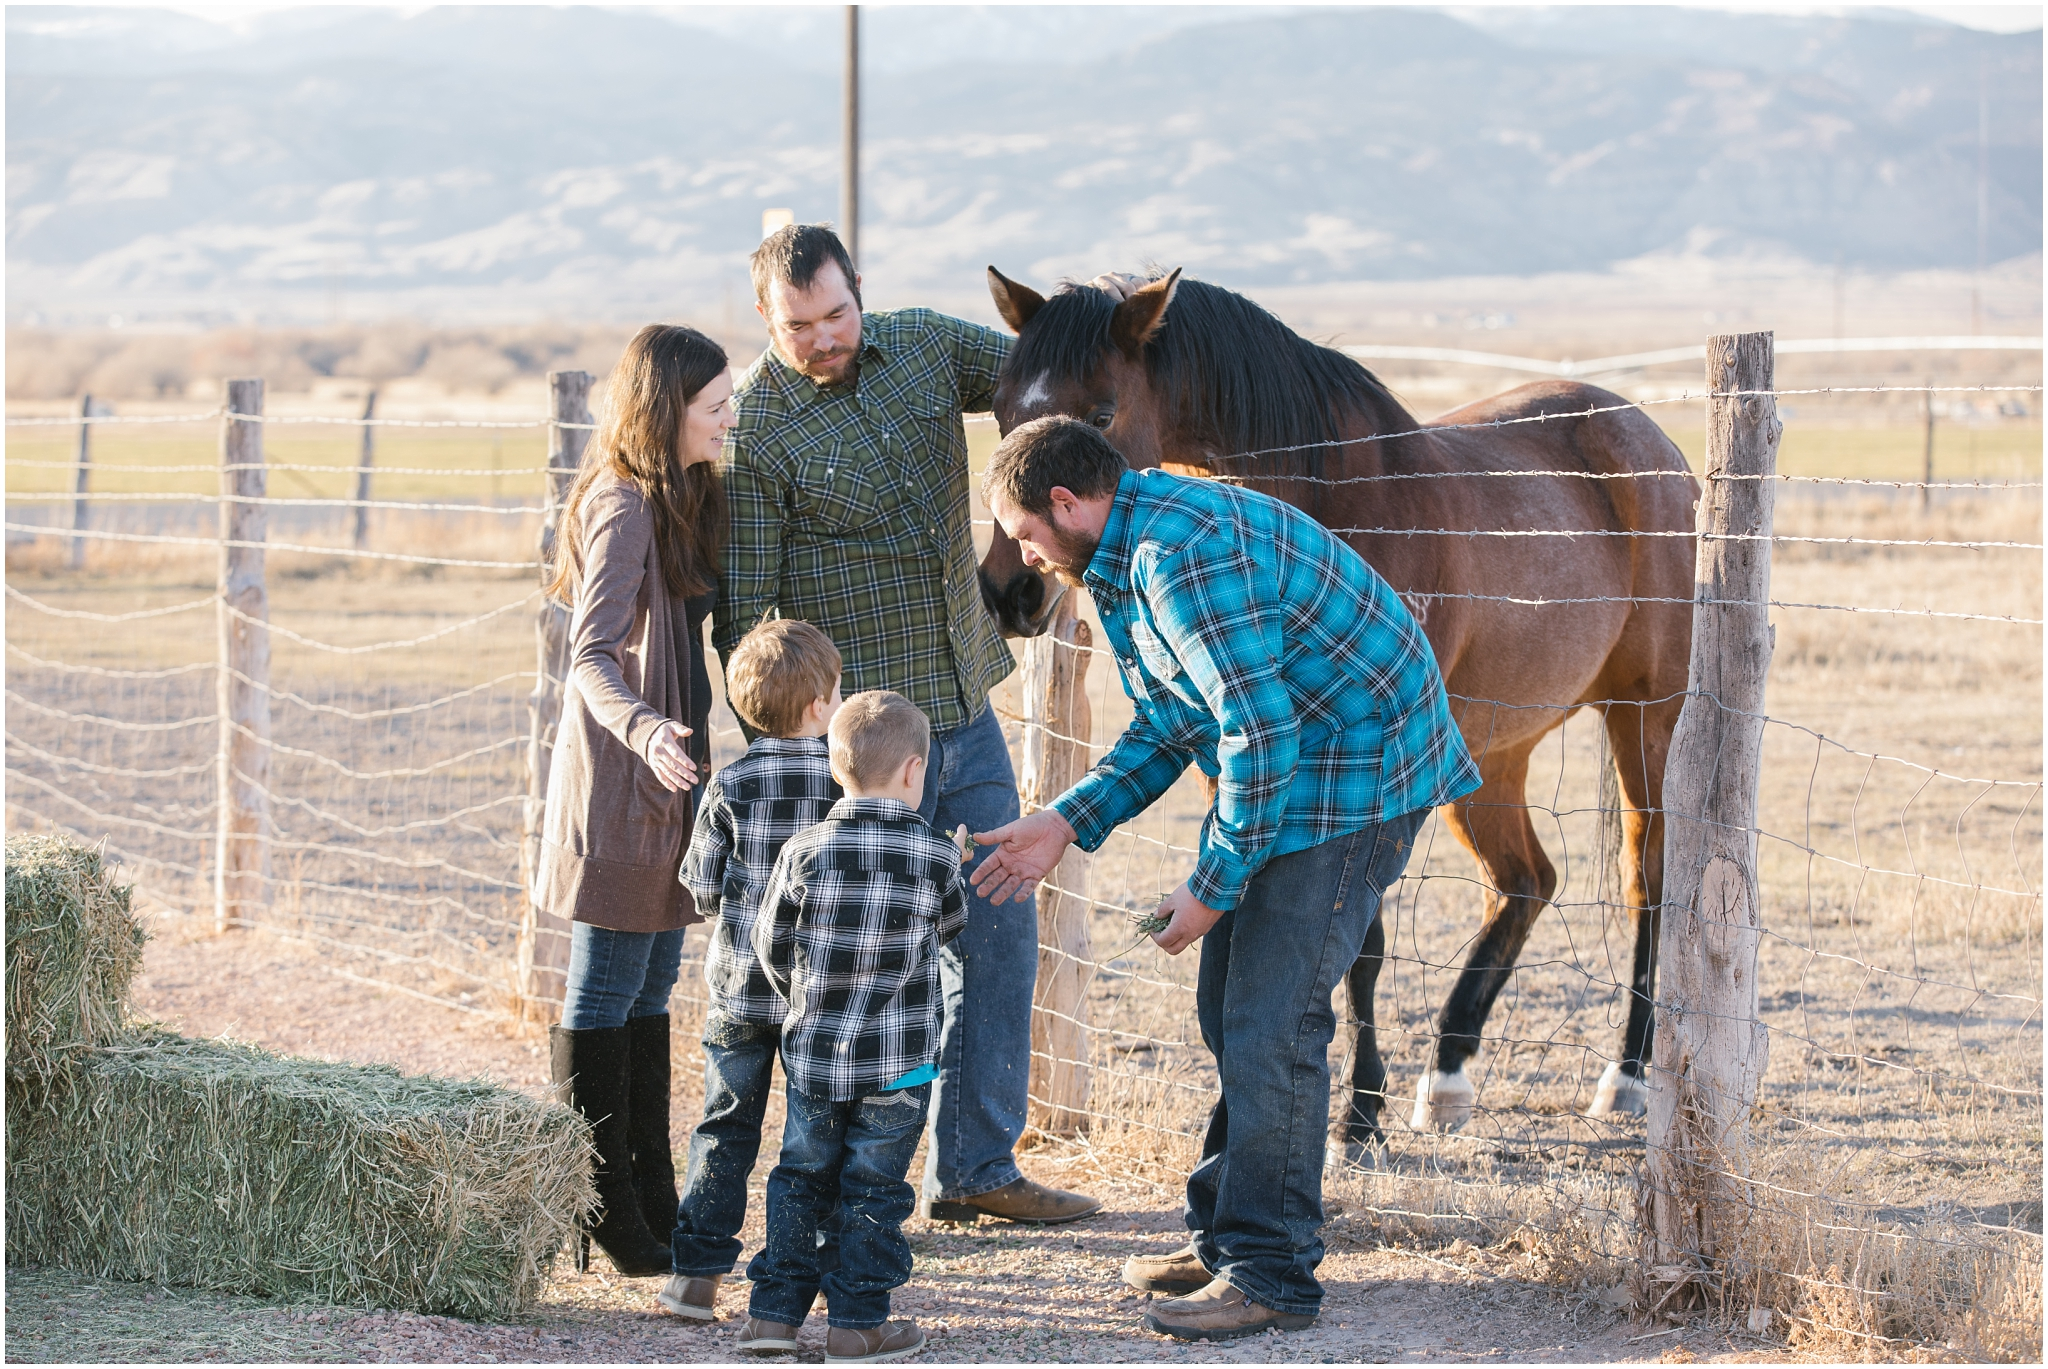 Conrad-74_Lizzie-B-Imagery-Utah-Family-Photographer-Utah-County-Central-Utah-Park-City-Extended-Family-Session.jpg